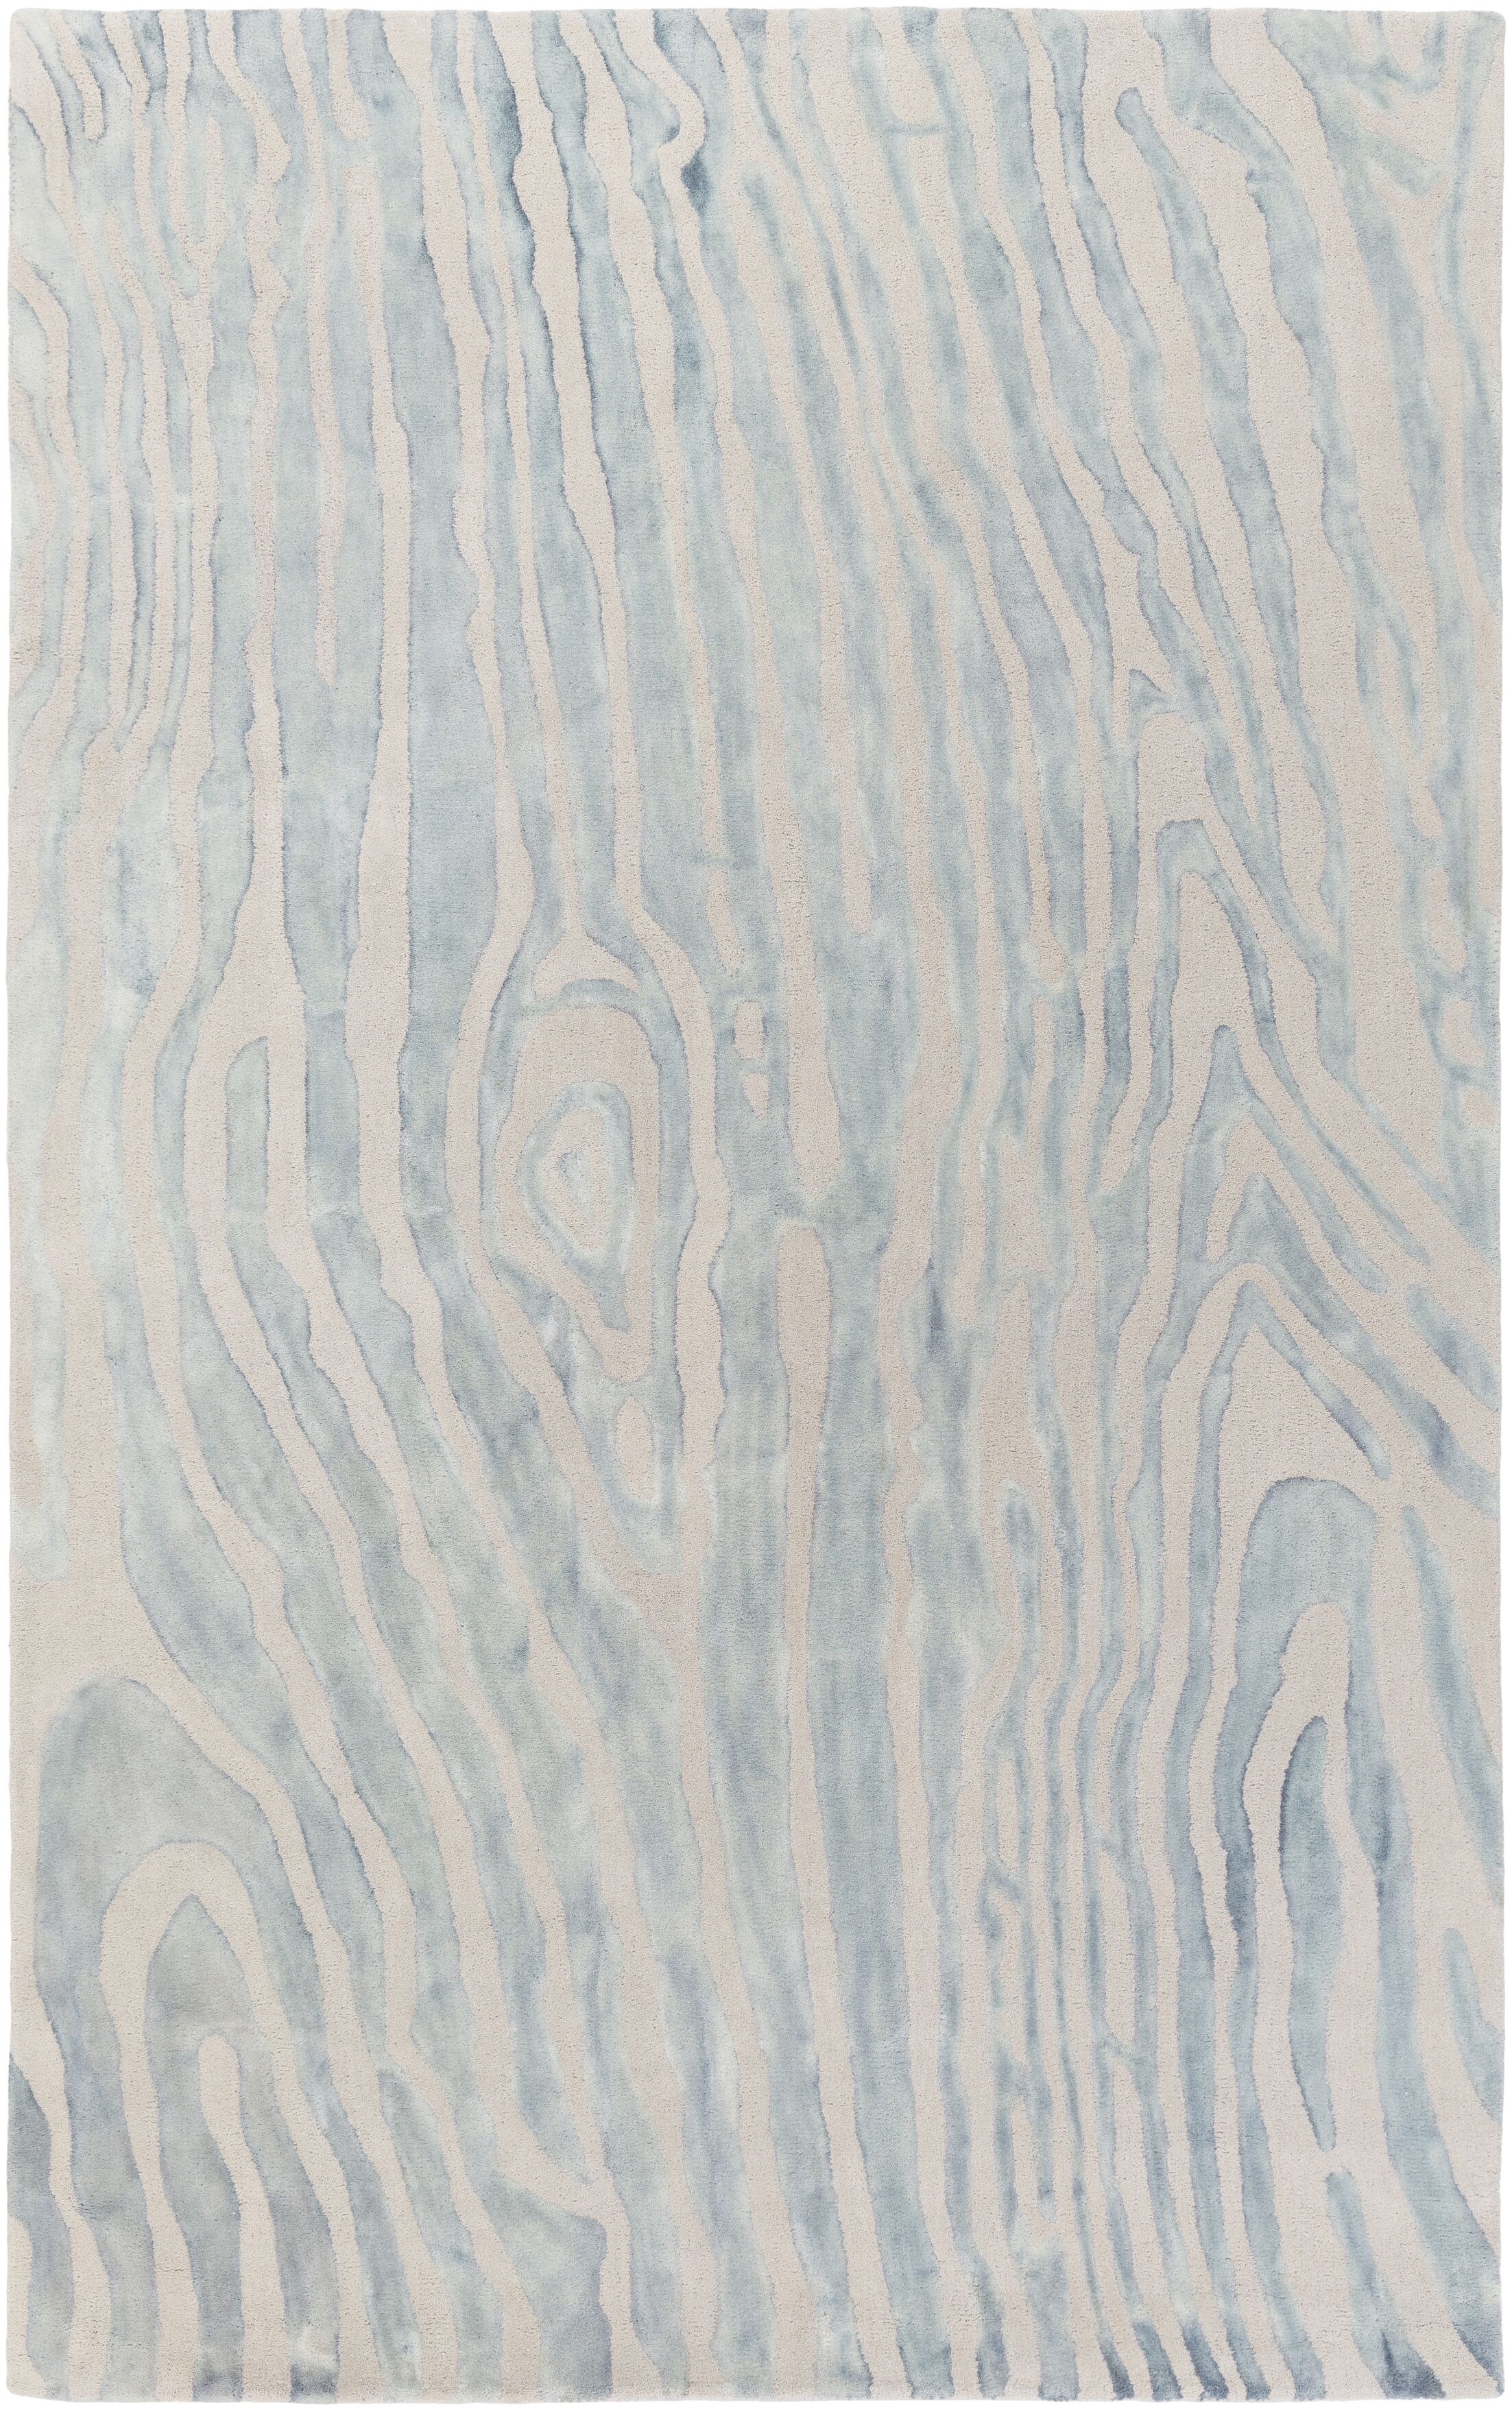 Little Sodbury Hand-Tufted Blue Area Rug Rug Size: Rectangle 9' x 13'